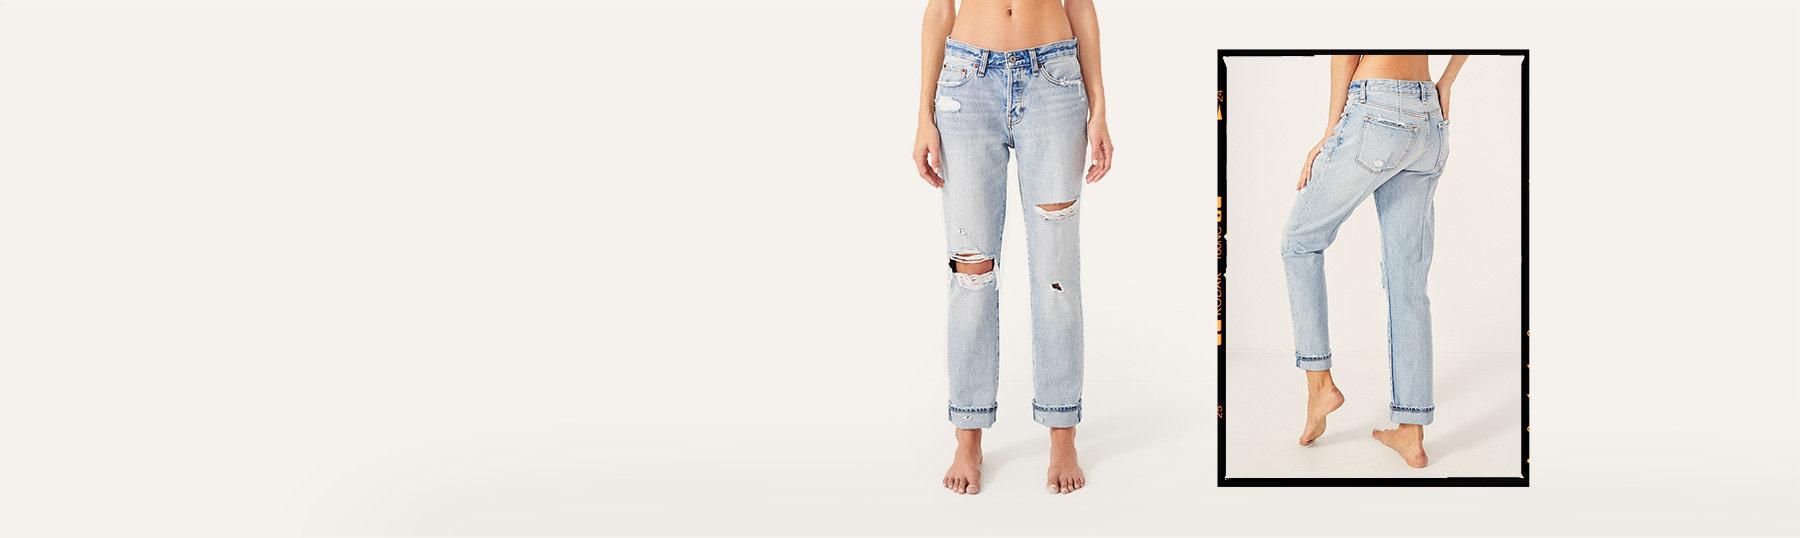 d992c9da76e woman in size 24 boyfriend jeans